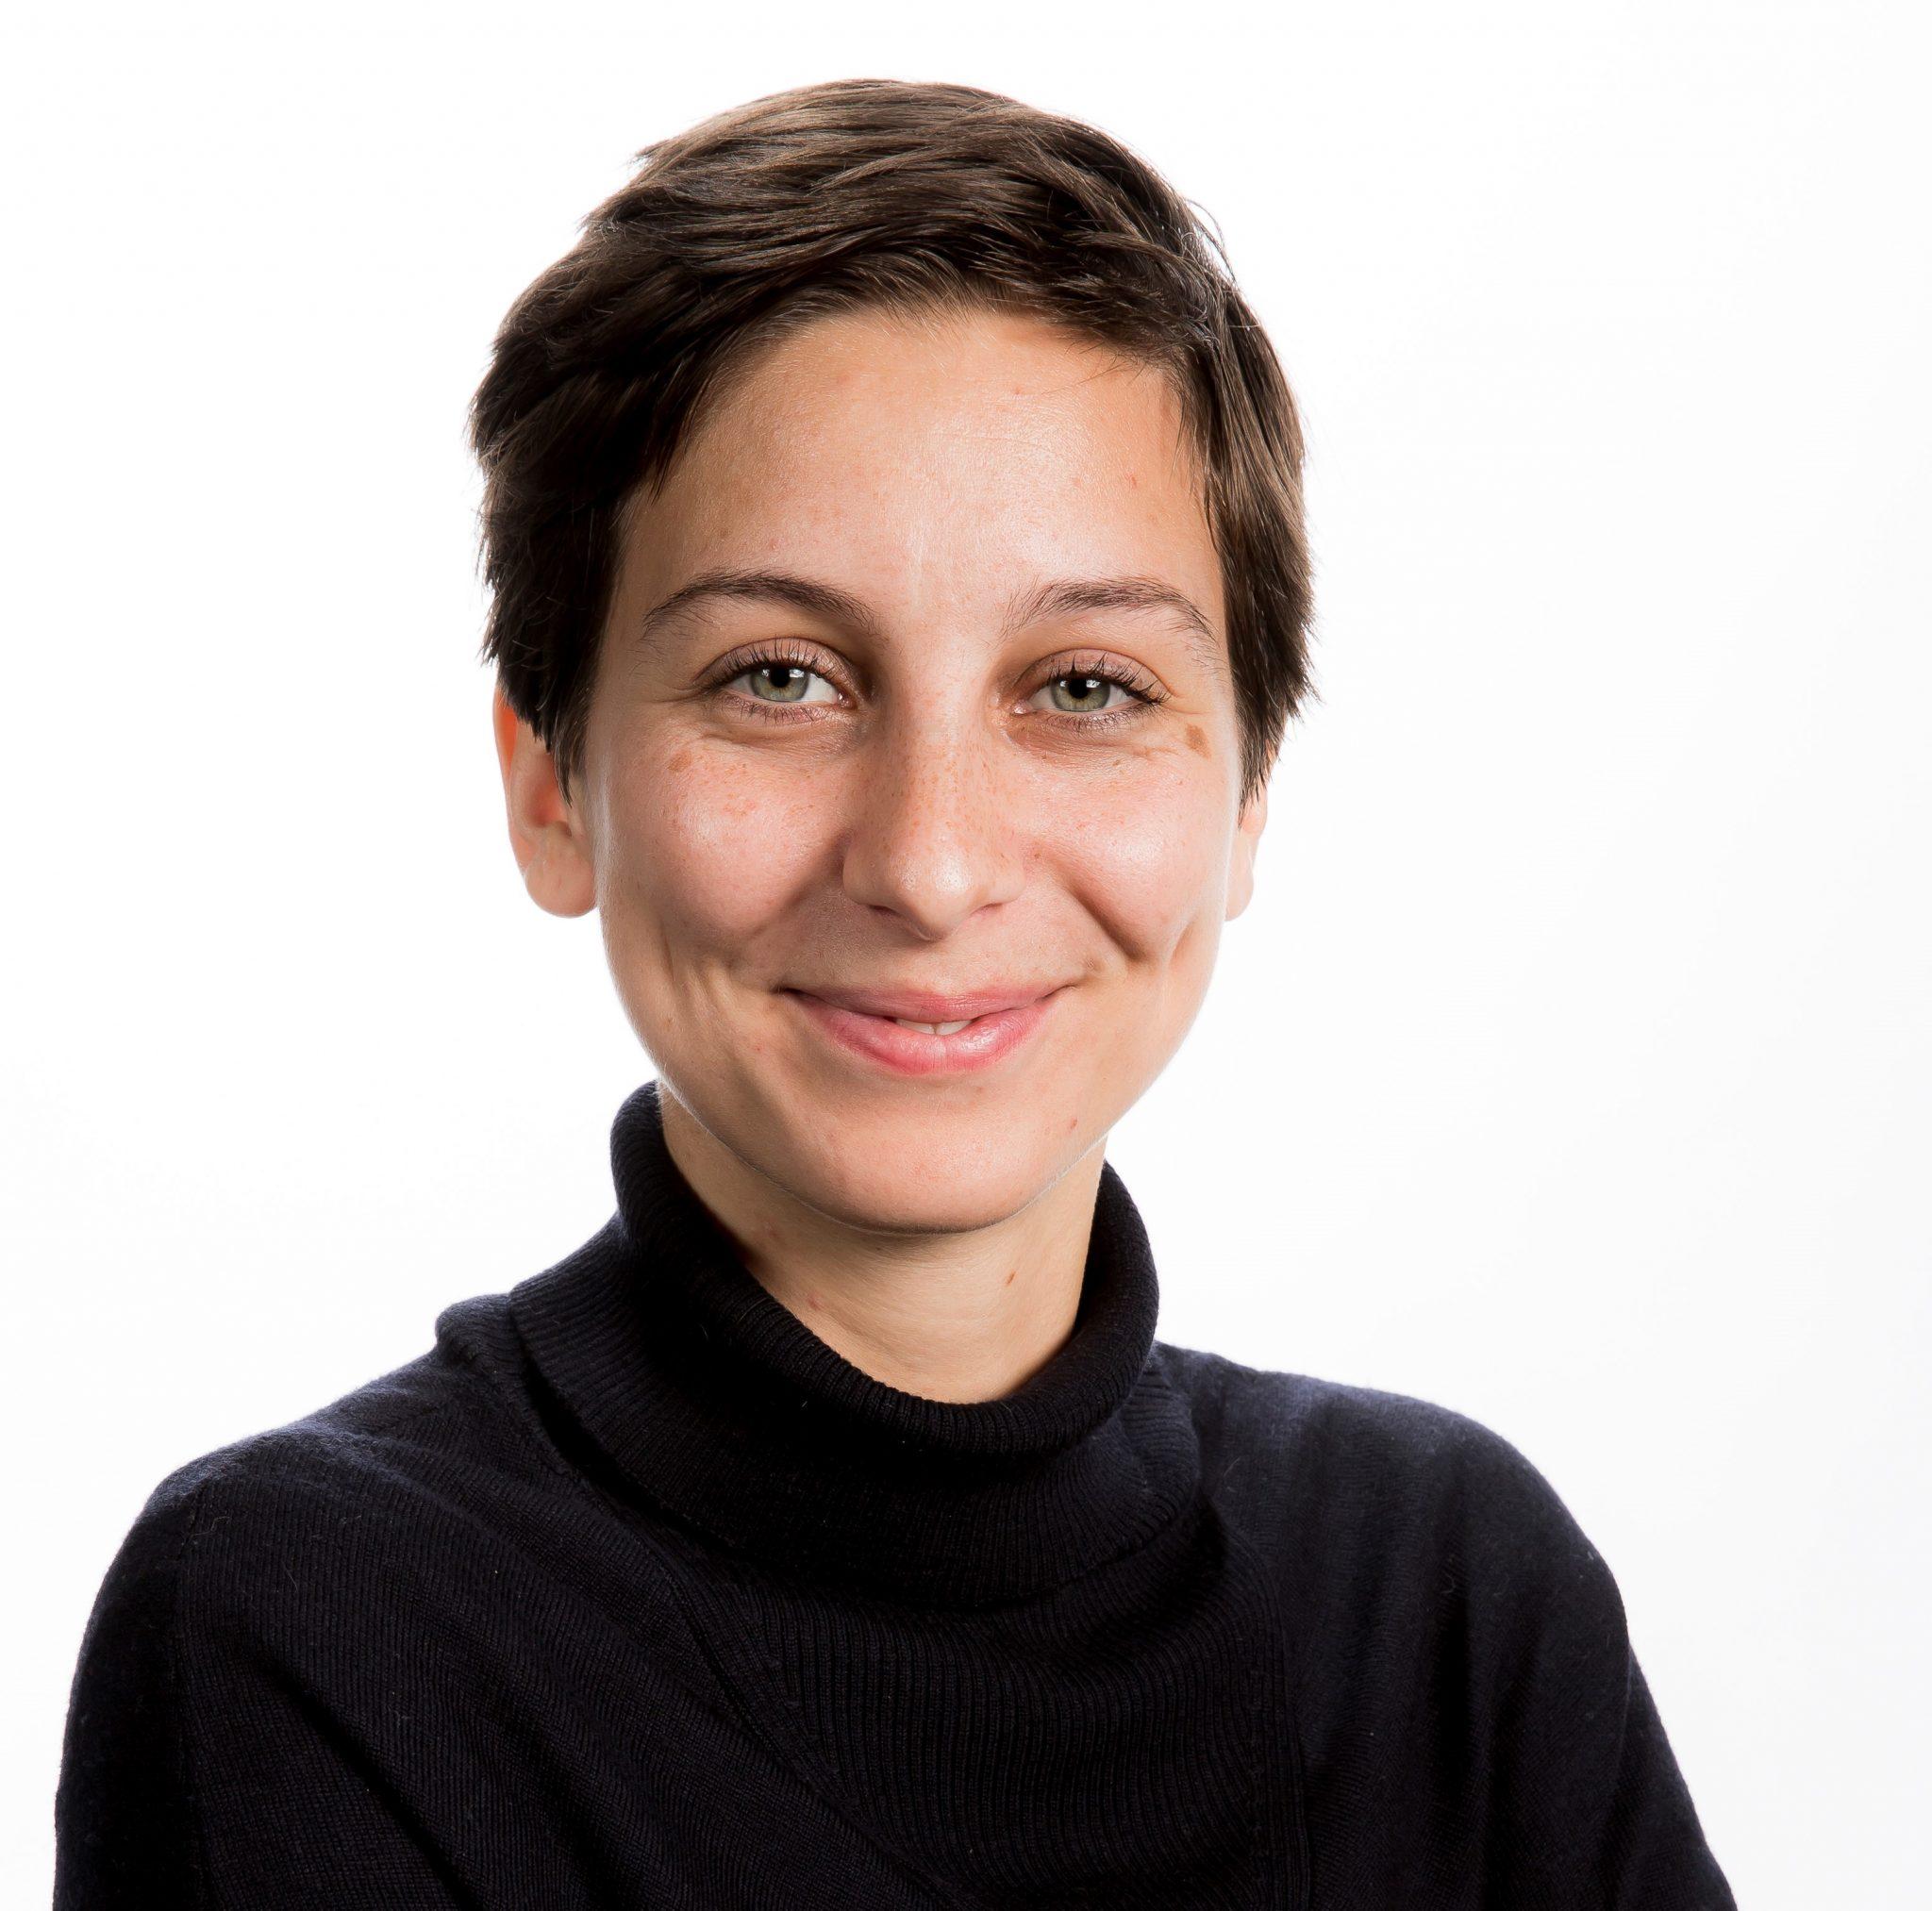 Teresa Labriola